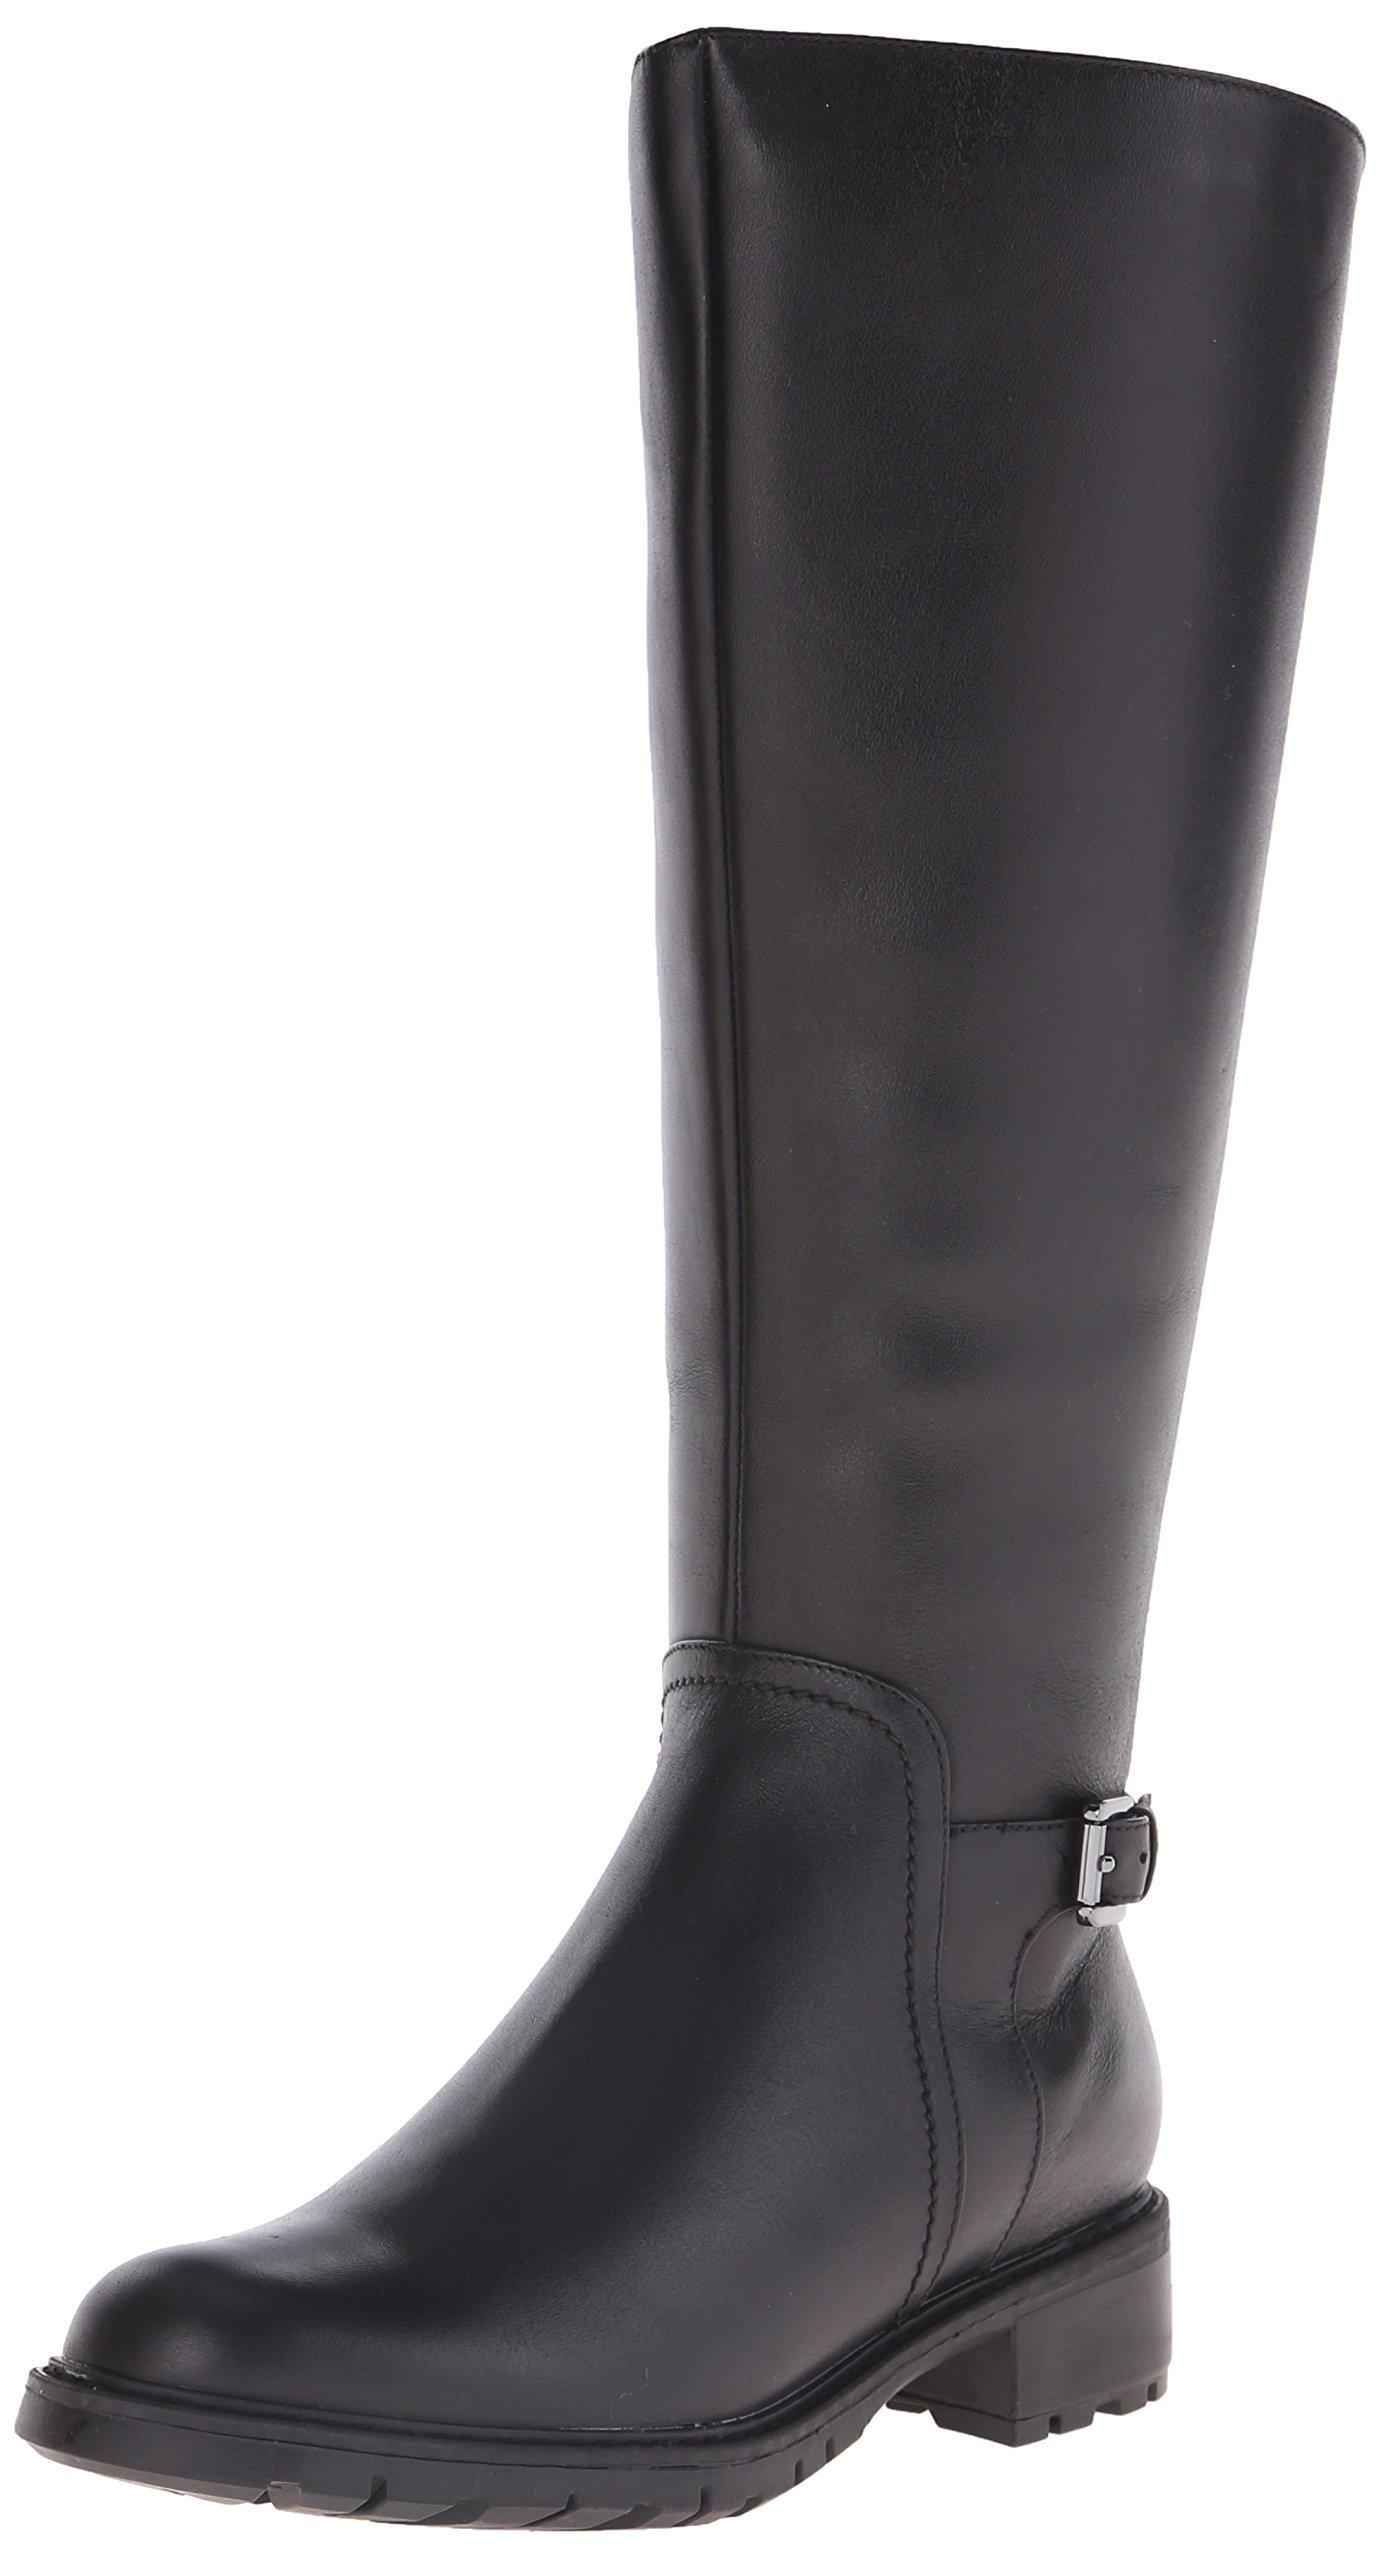 Blondo Women's Vassa Ws Waterproof Riding Boot, Black Leather, 9 M US